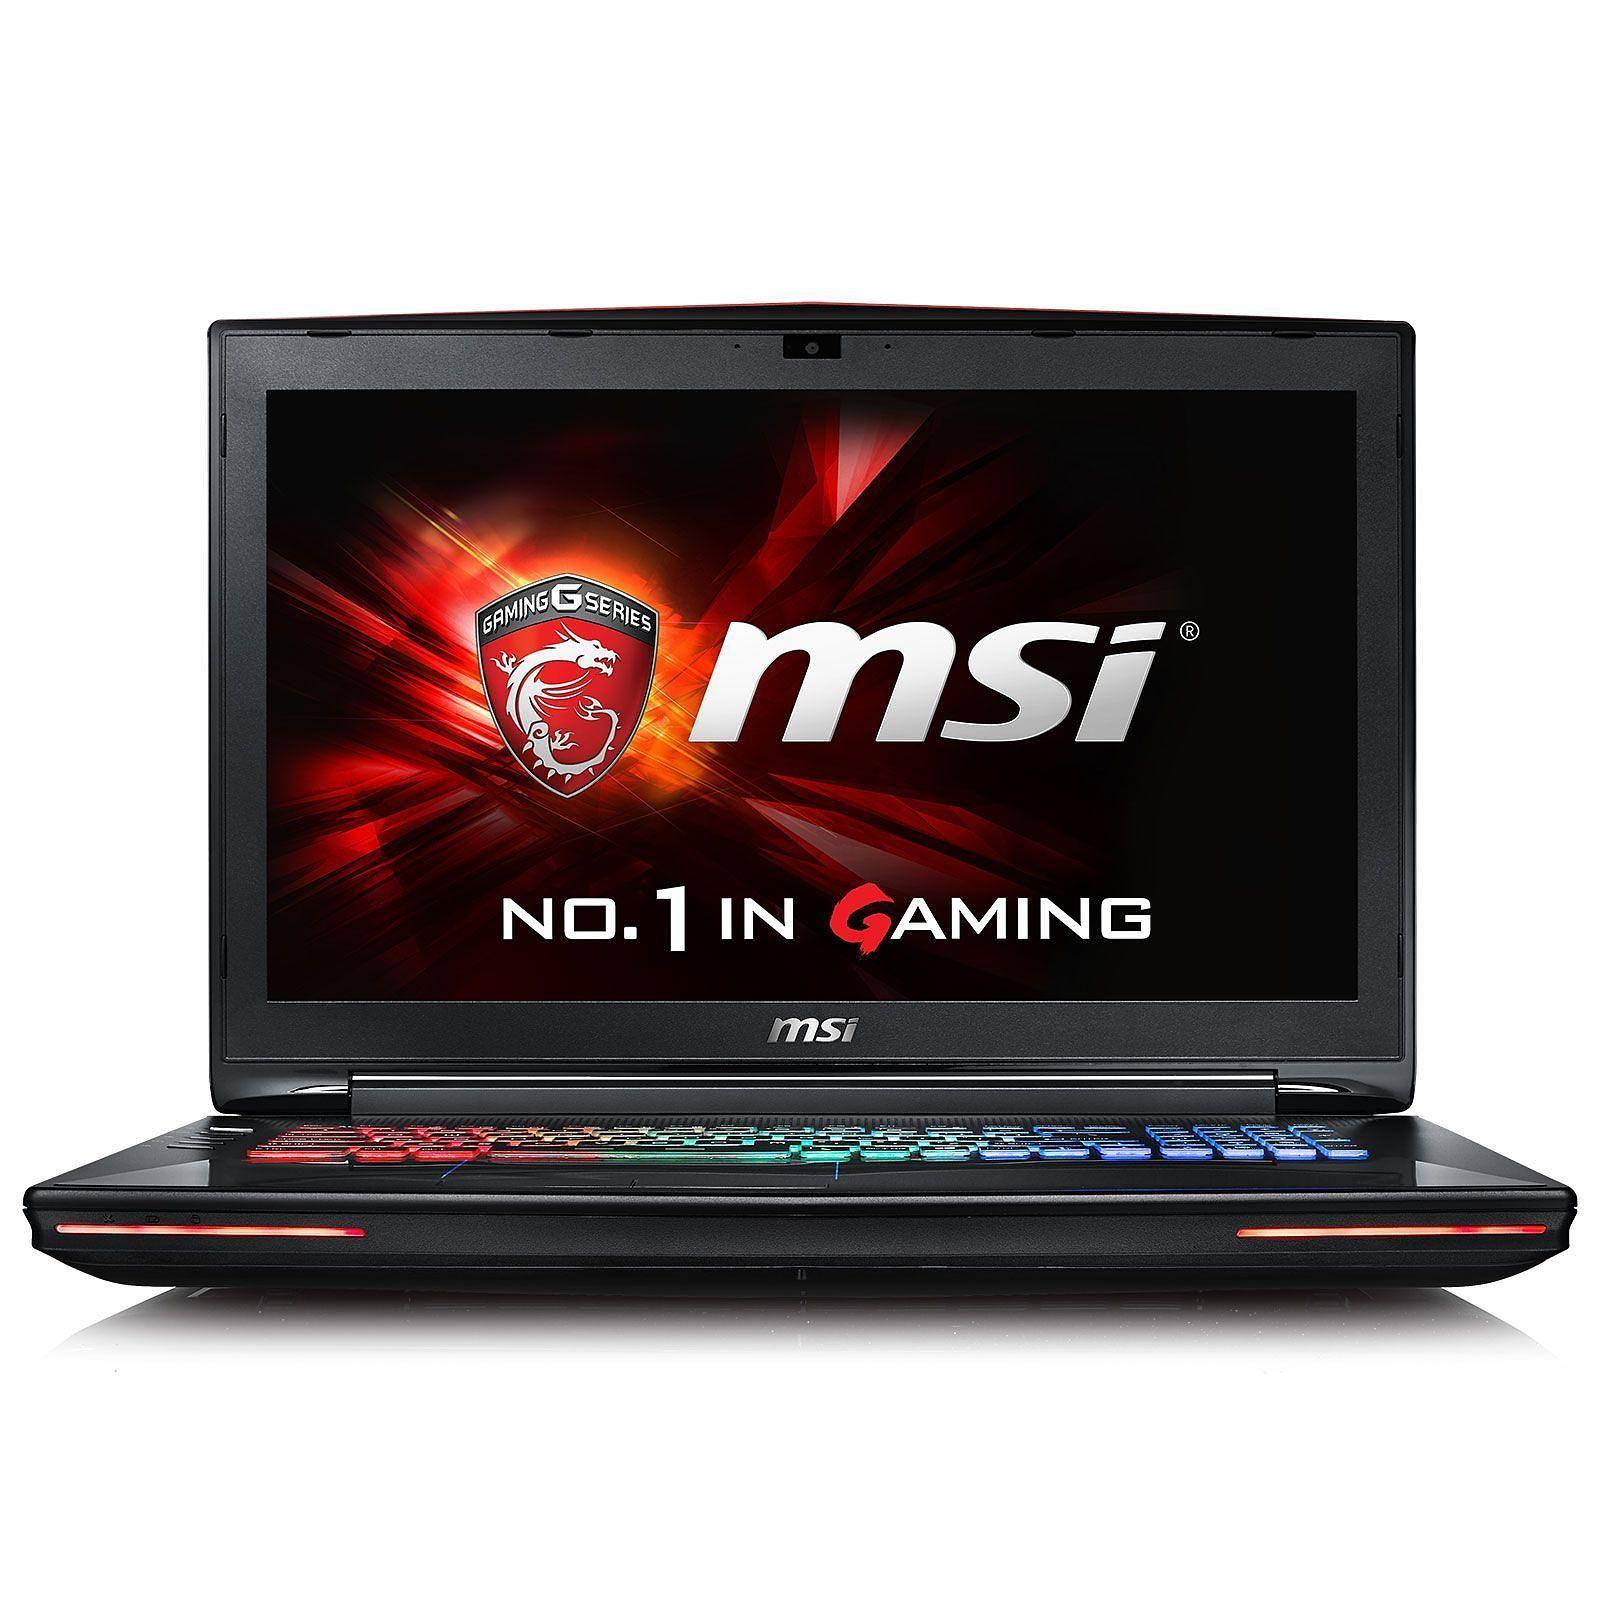 Dominator Pro GT72S 17″ MSI Core i7-6820HK – SSD 1To + HDD 1 To – 64 Go – GeForce GTX 980 8Go – Prix d'origine 3390€ – NEUF